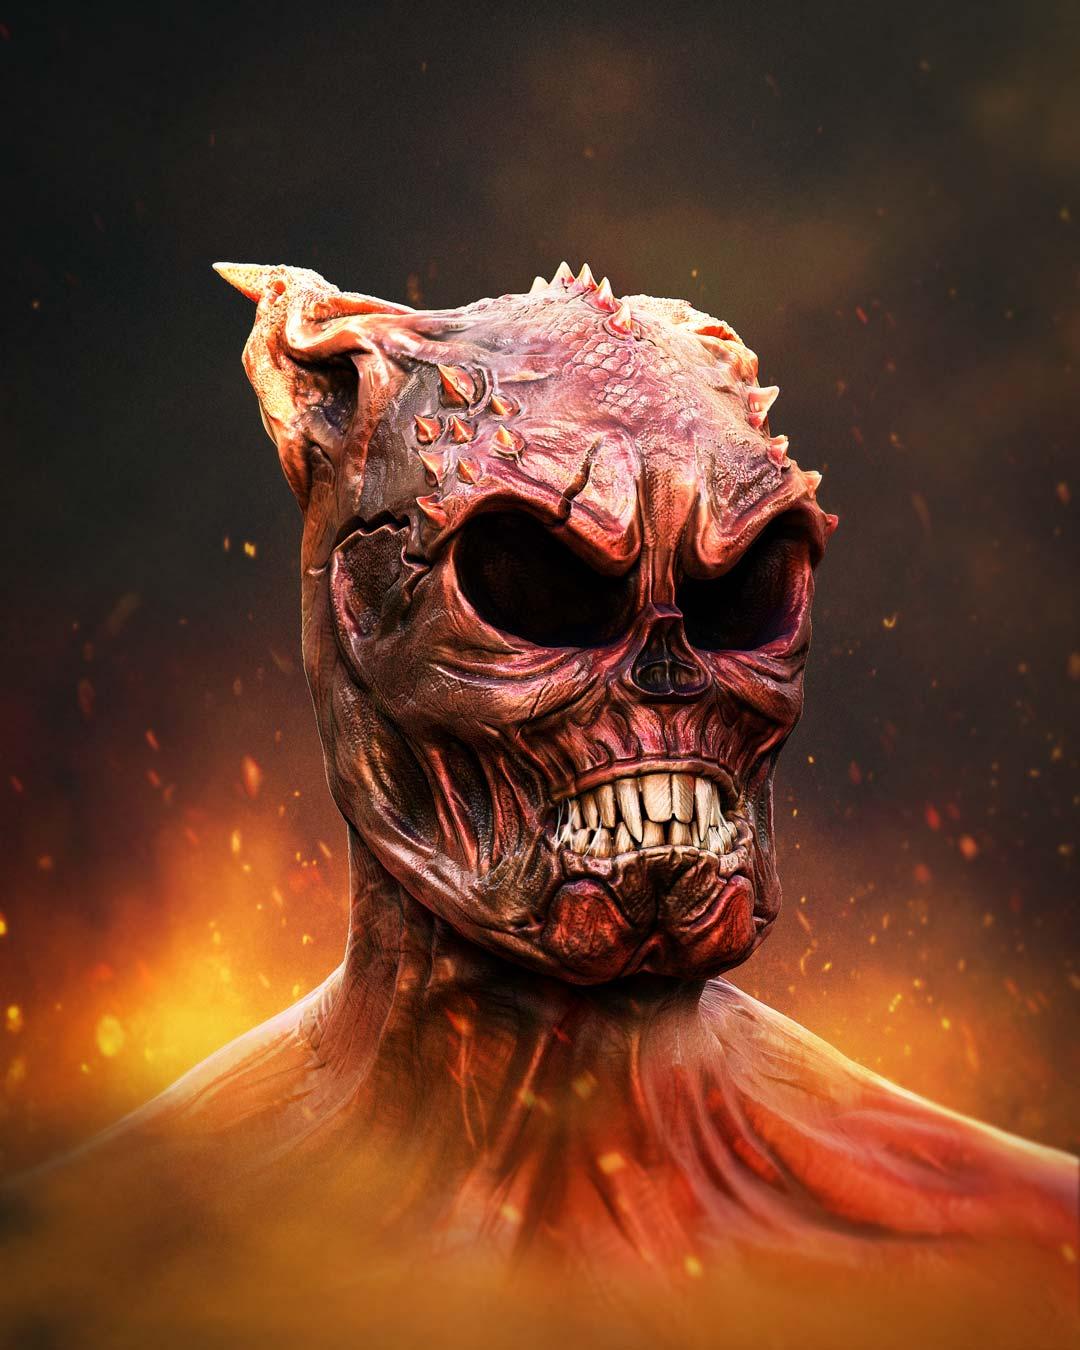 The Devil by Adam Ingle